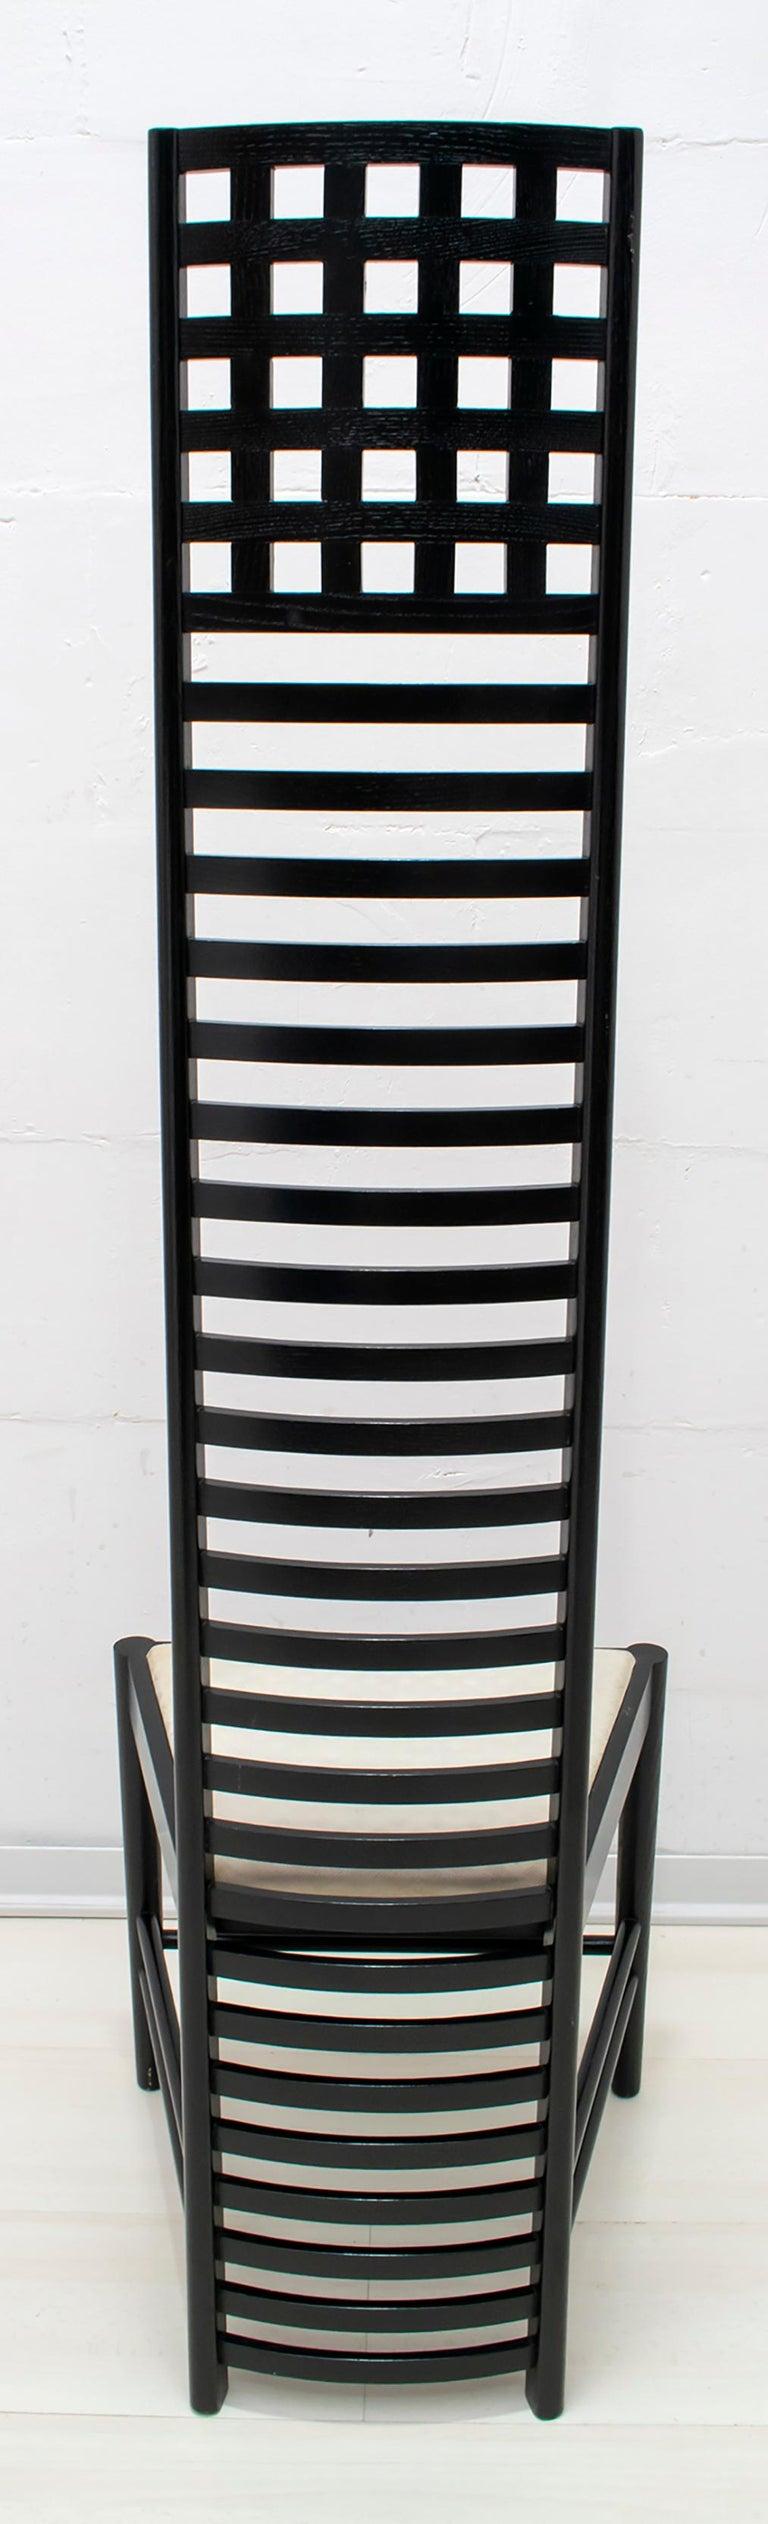 Charles Rennie Mackintosh High Back Chairs